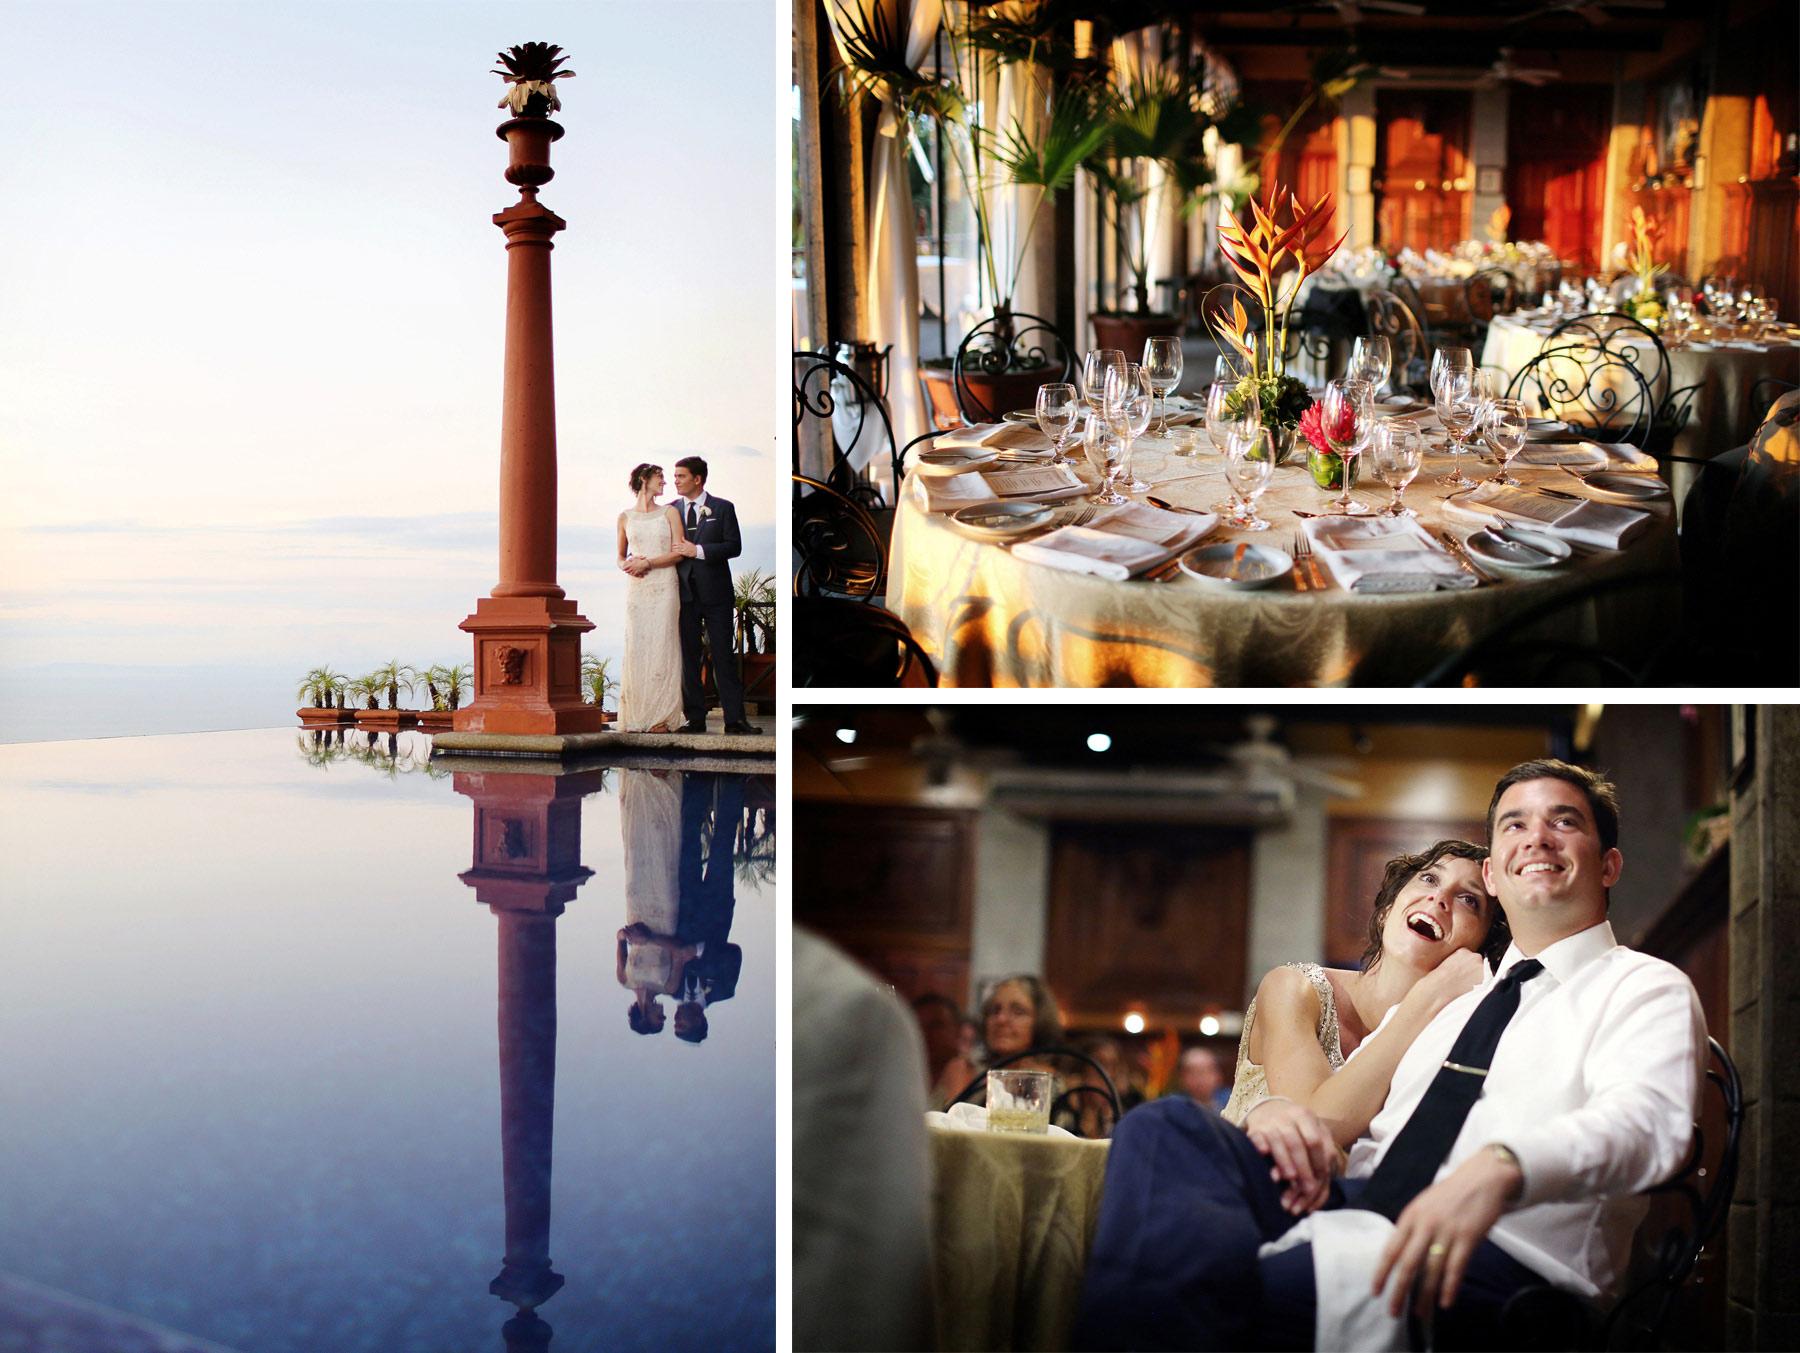 20-Costa-Rica-Wedding-Photography-by-Vick-Photography-Jaco-Island-Villa-Caletas-Resort-Ocean-View-Sunset-Alli-and-Duncan.jpg